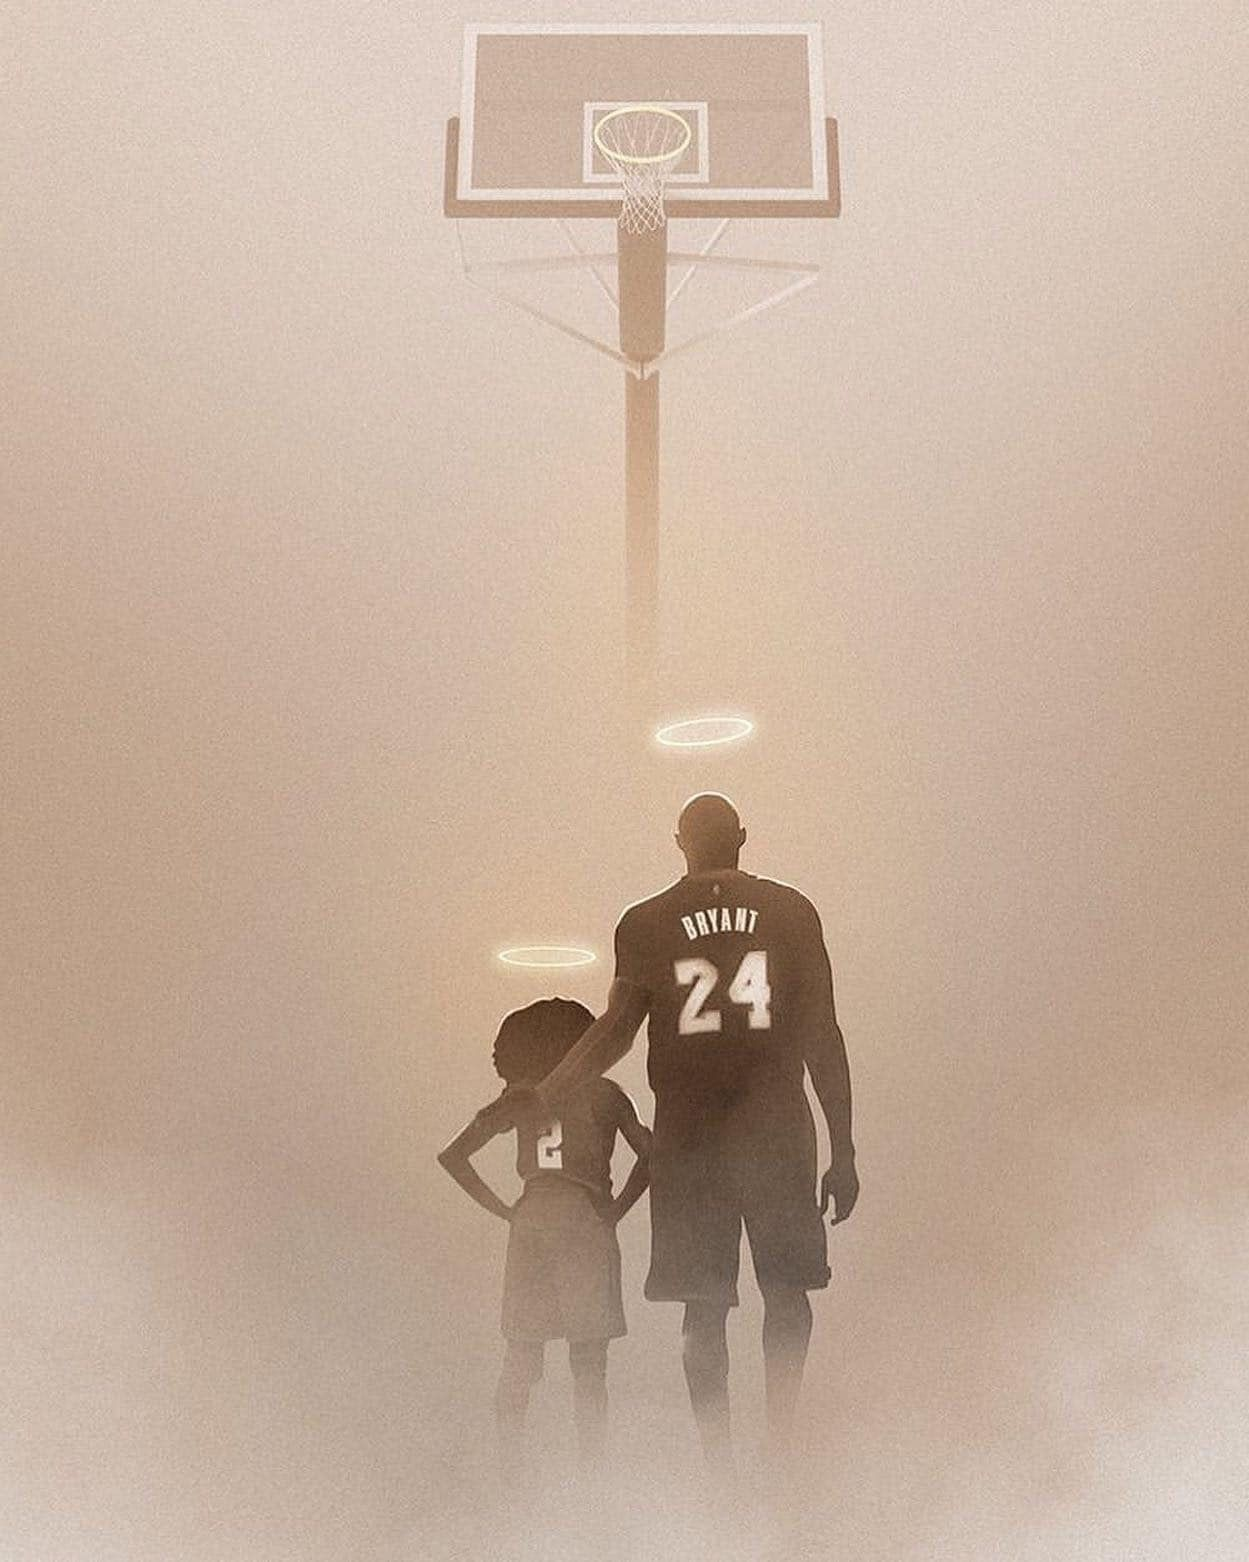 Gigi and Kobe Bryant in 2020 Kobe, Black mamba, Artwork